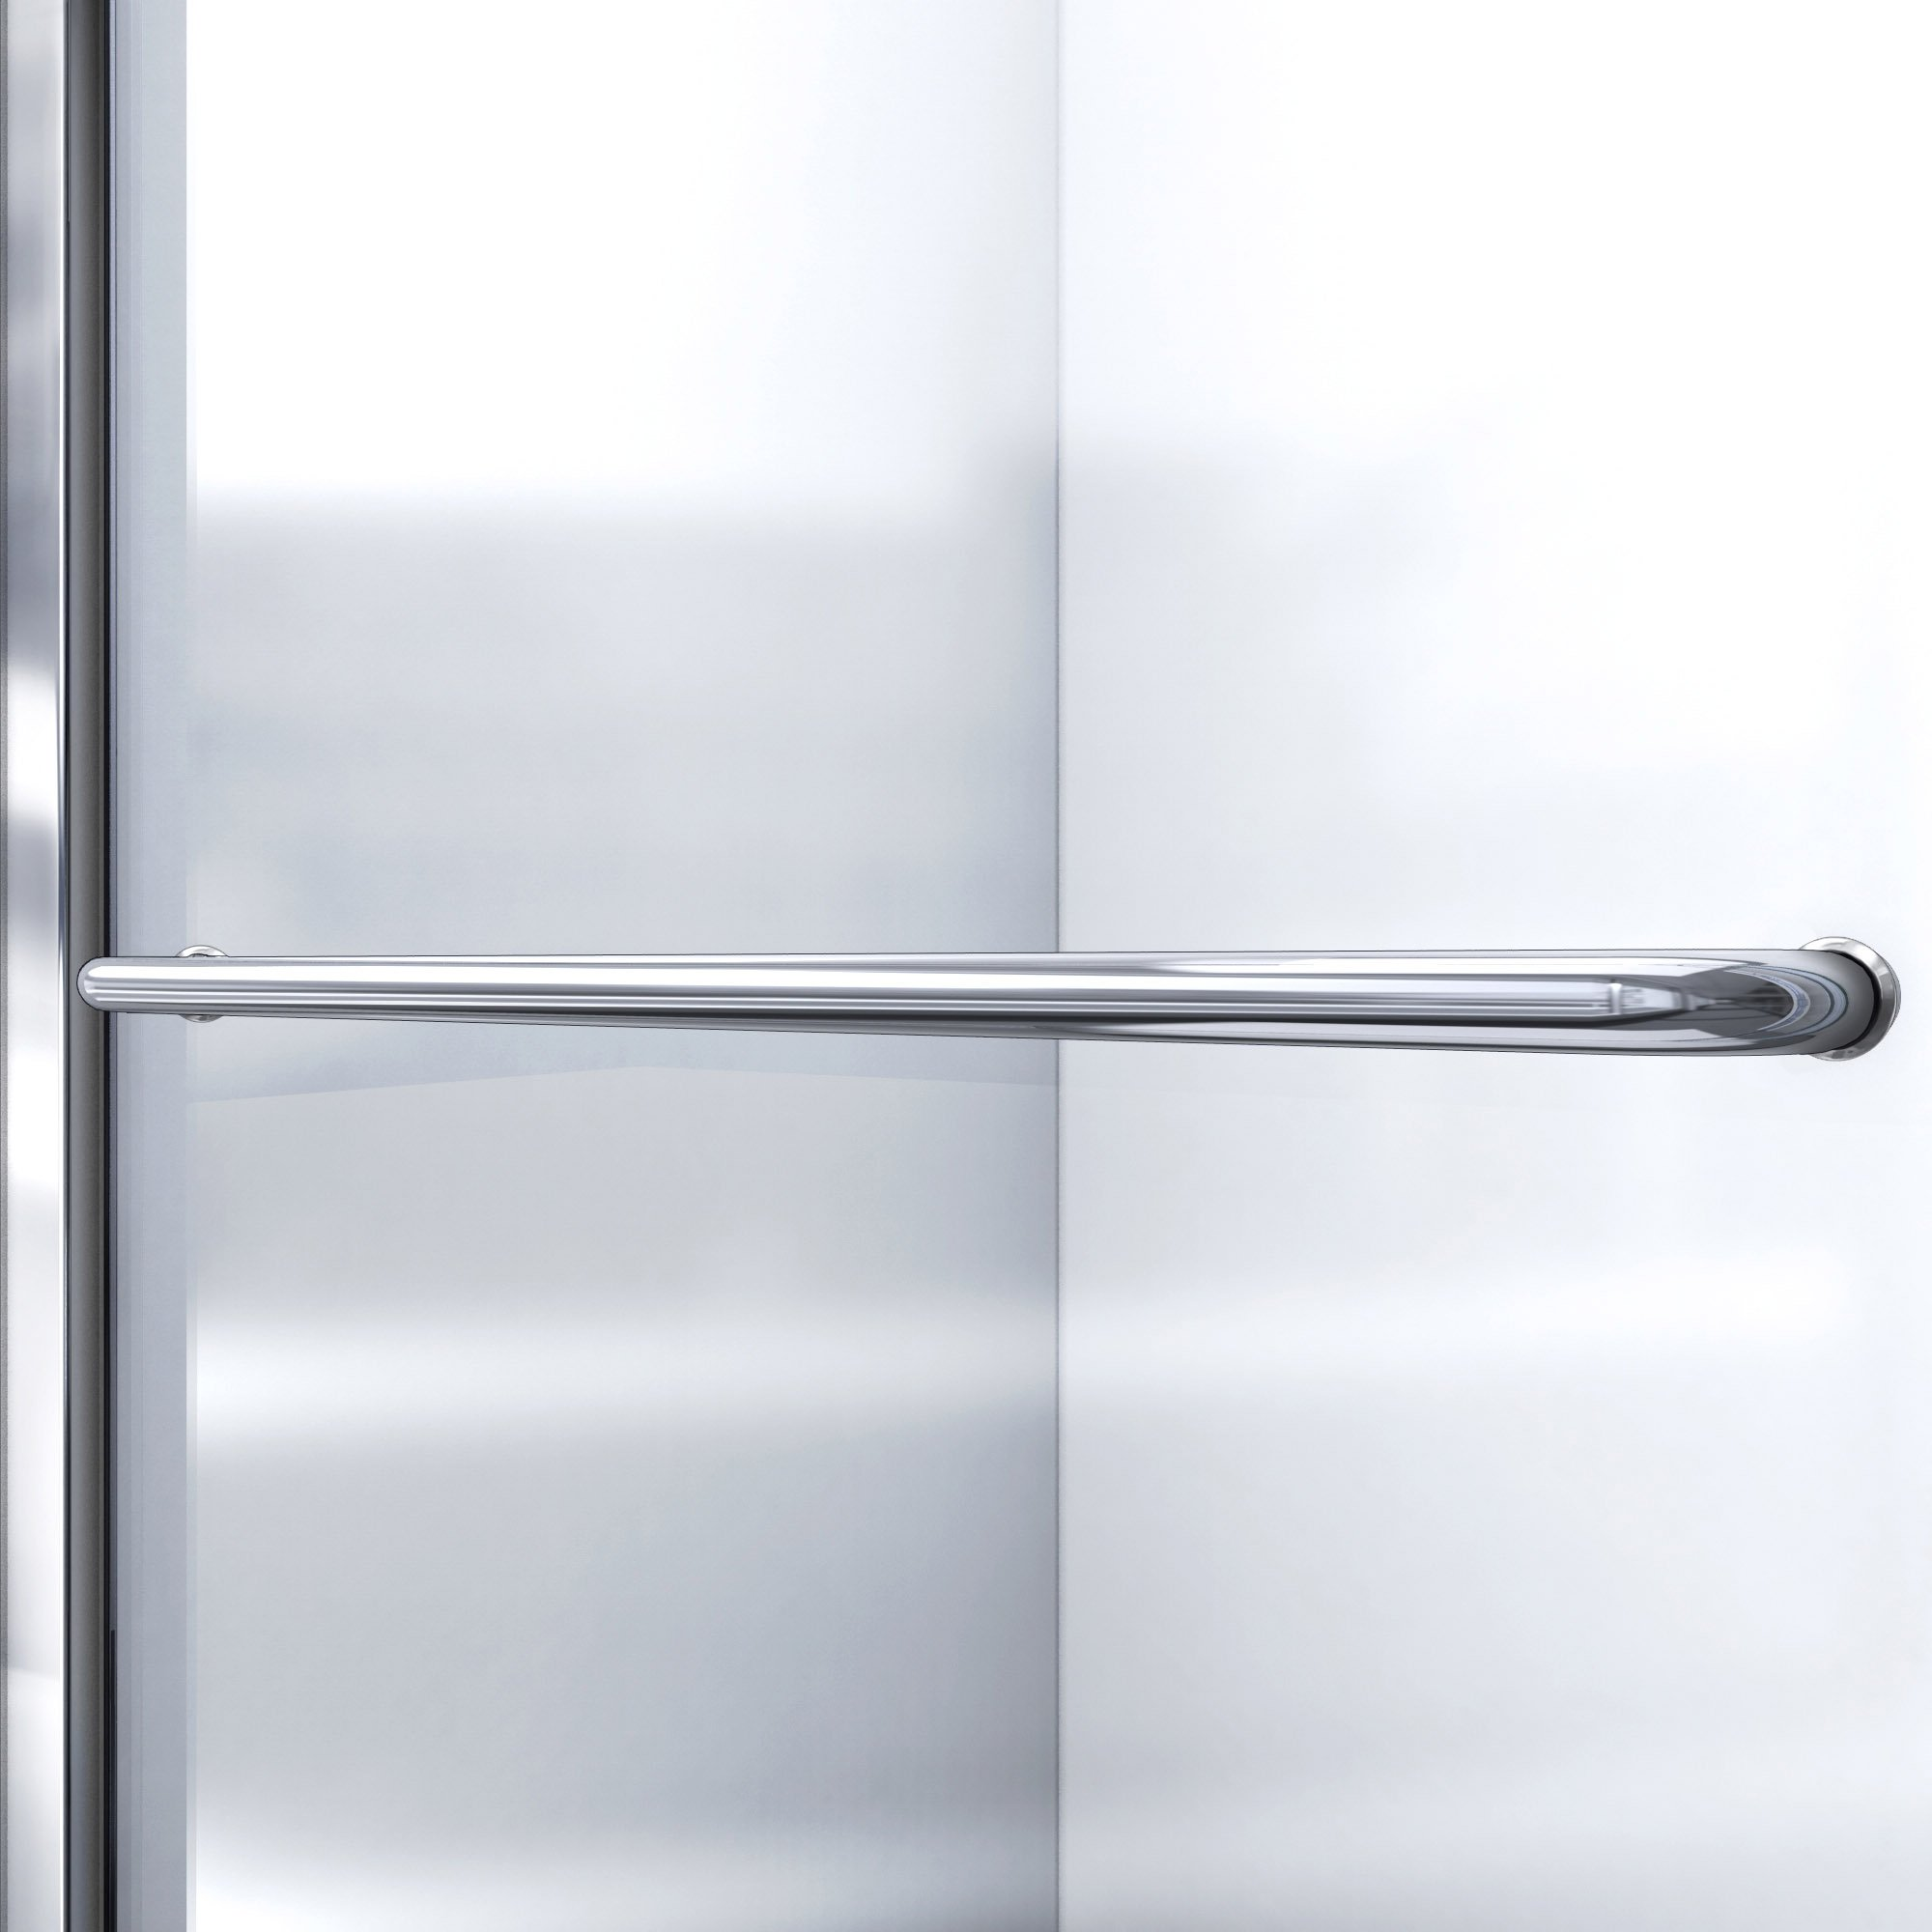 DreamLine Infinity-Z 50-54 in. W x 72 in. H Semi-Frameless Sliding Shower Door, Clear Glass in Brushed Nickel, SHDR-0954720-04 by DreamLine (Image #5)